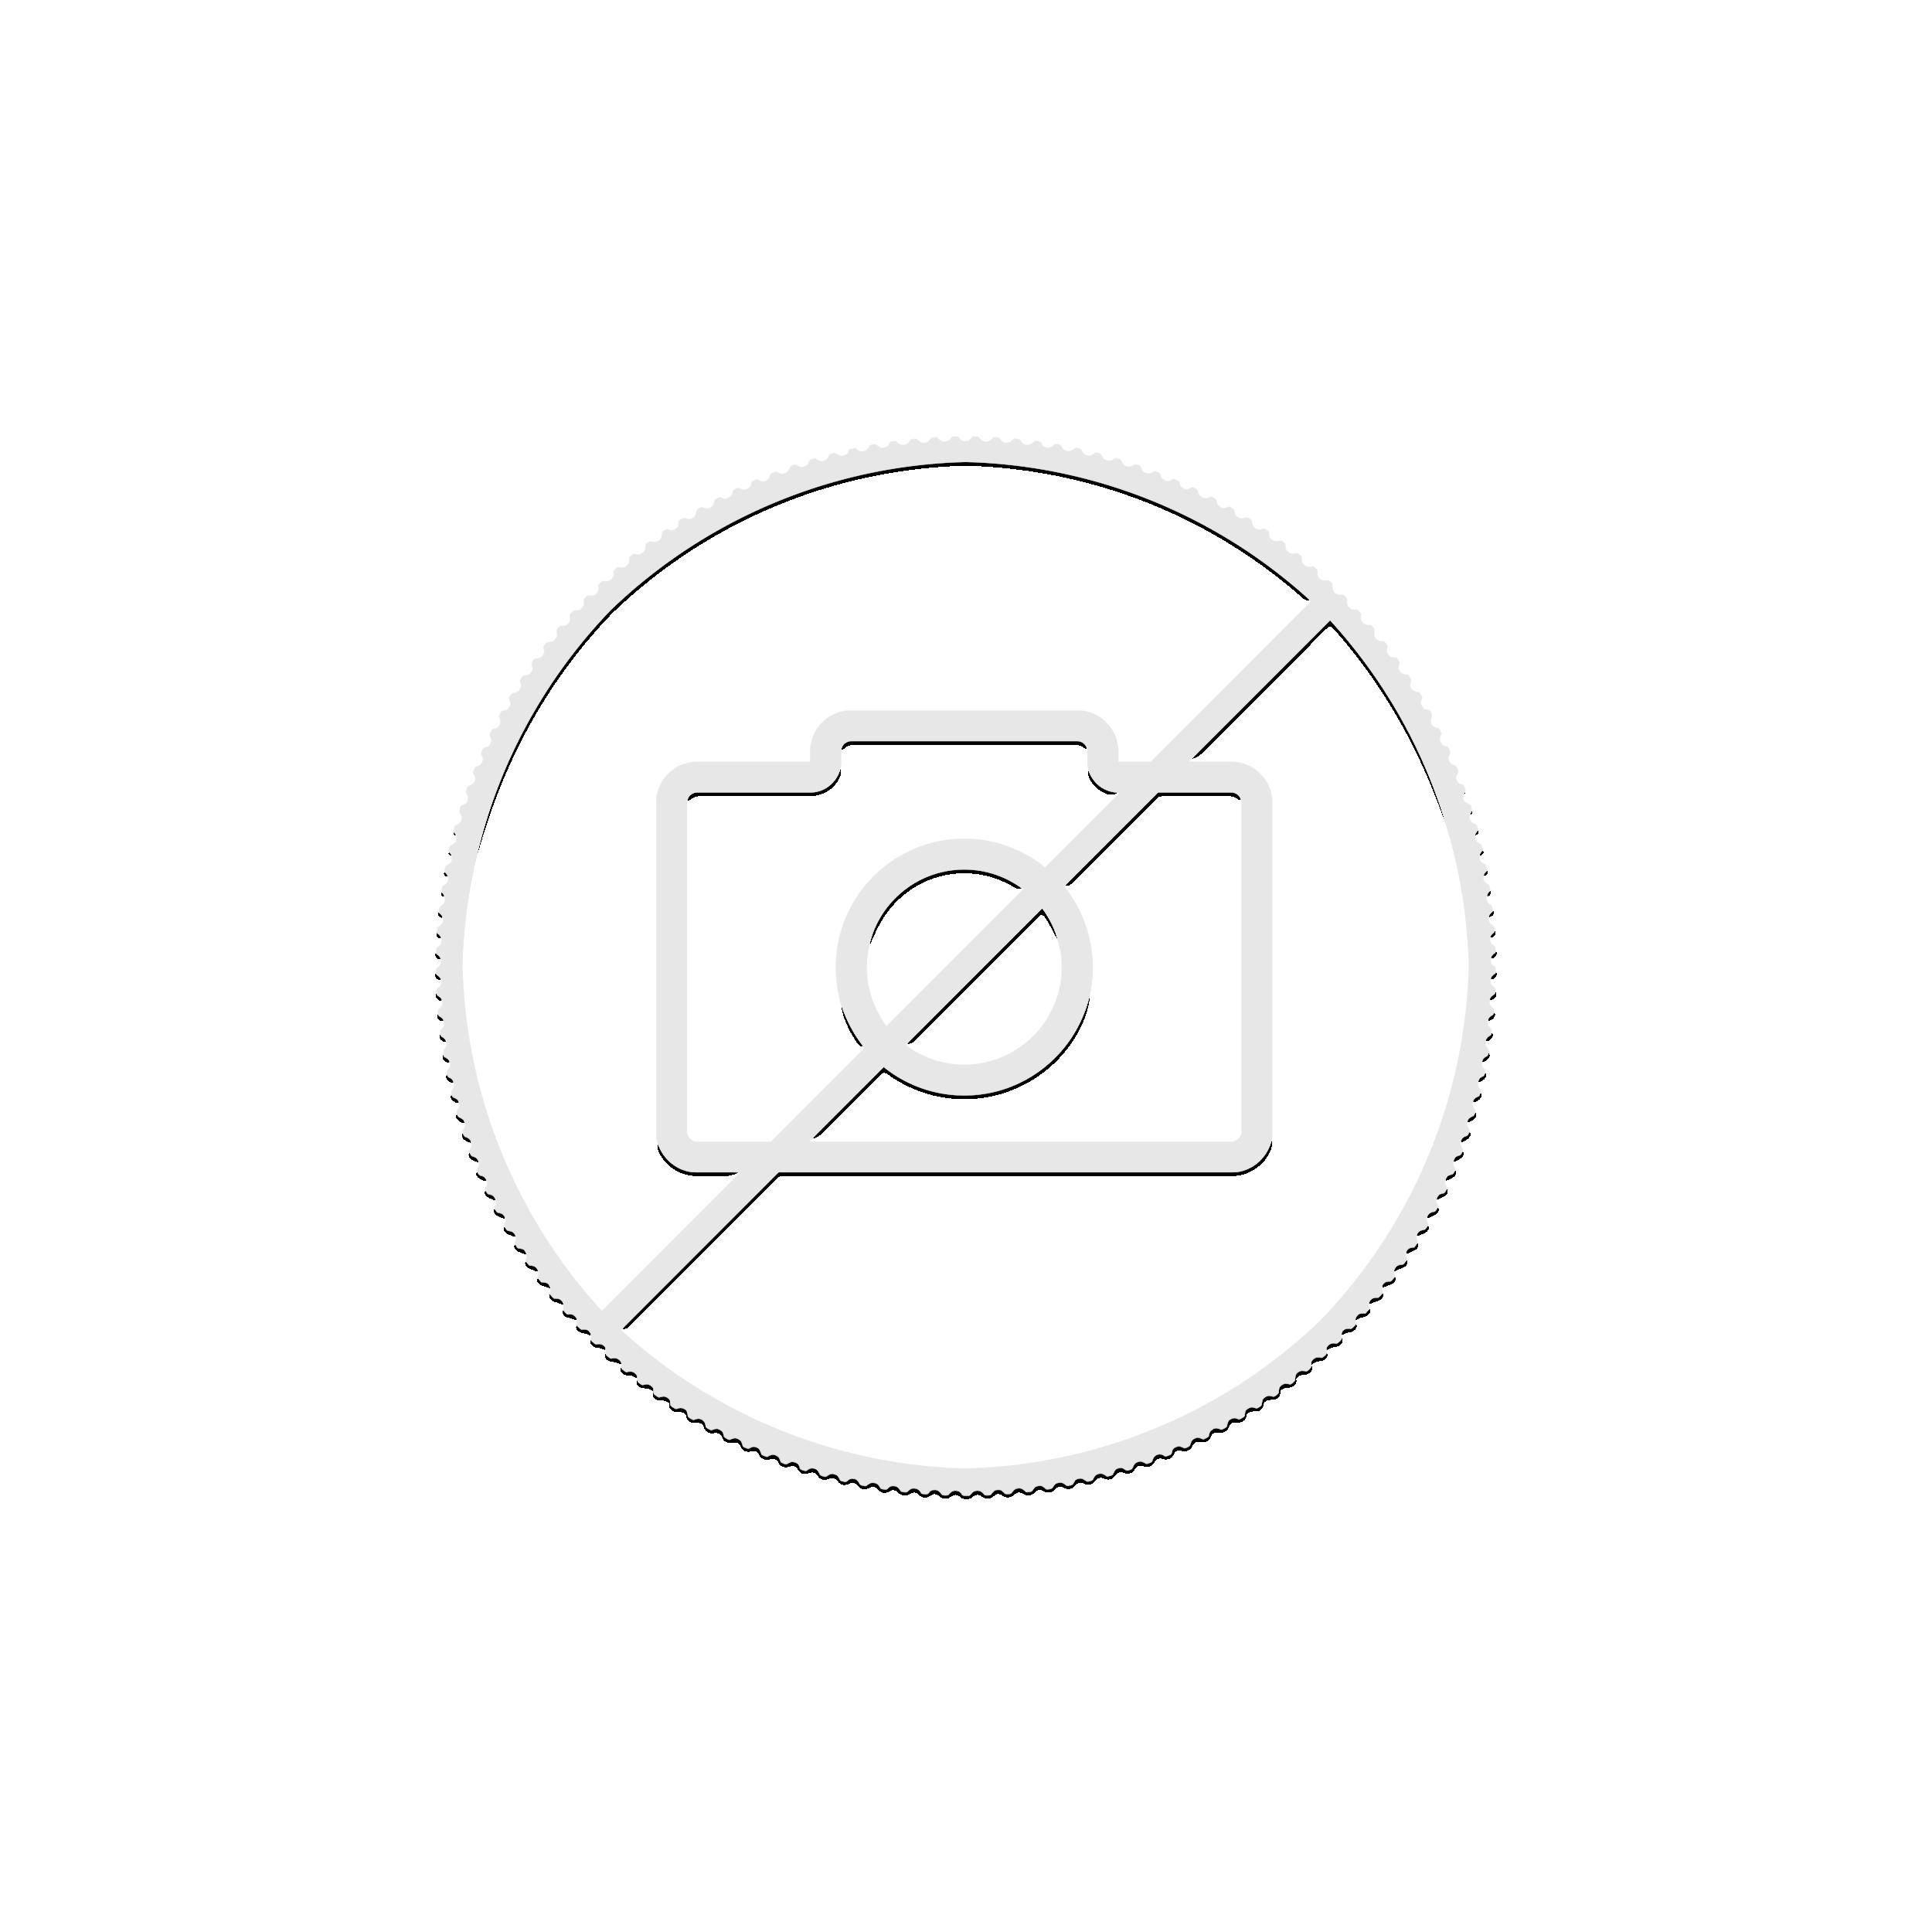 1 troy ounce zilveren munt Super incuse Maple 2021